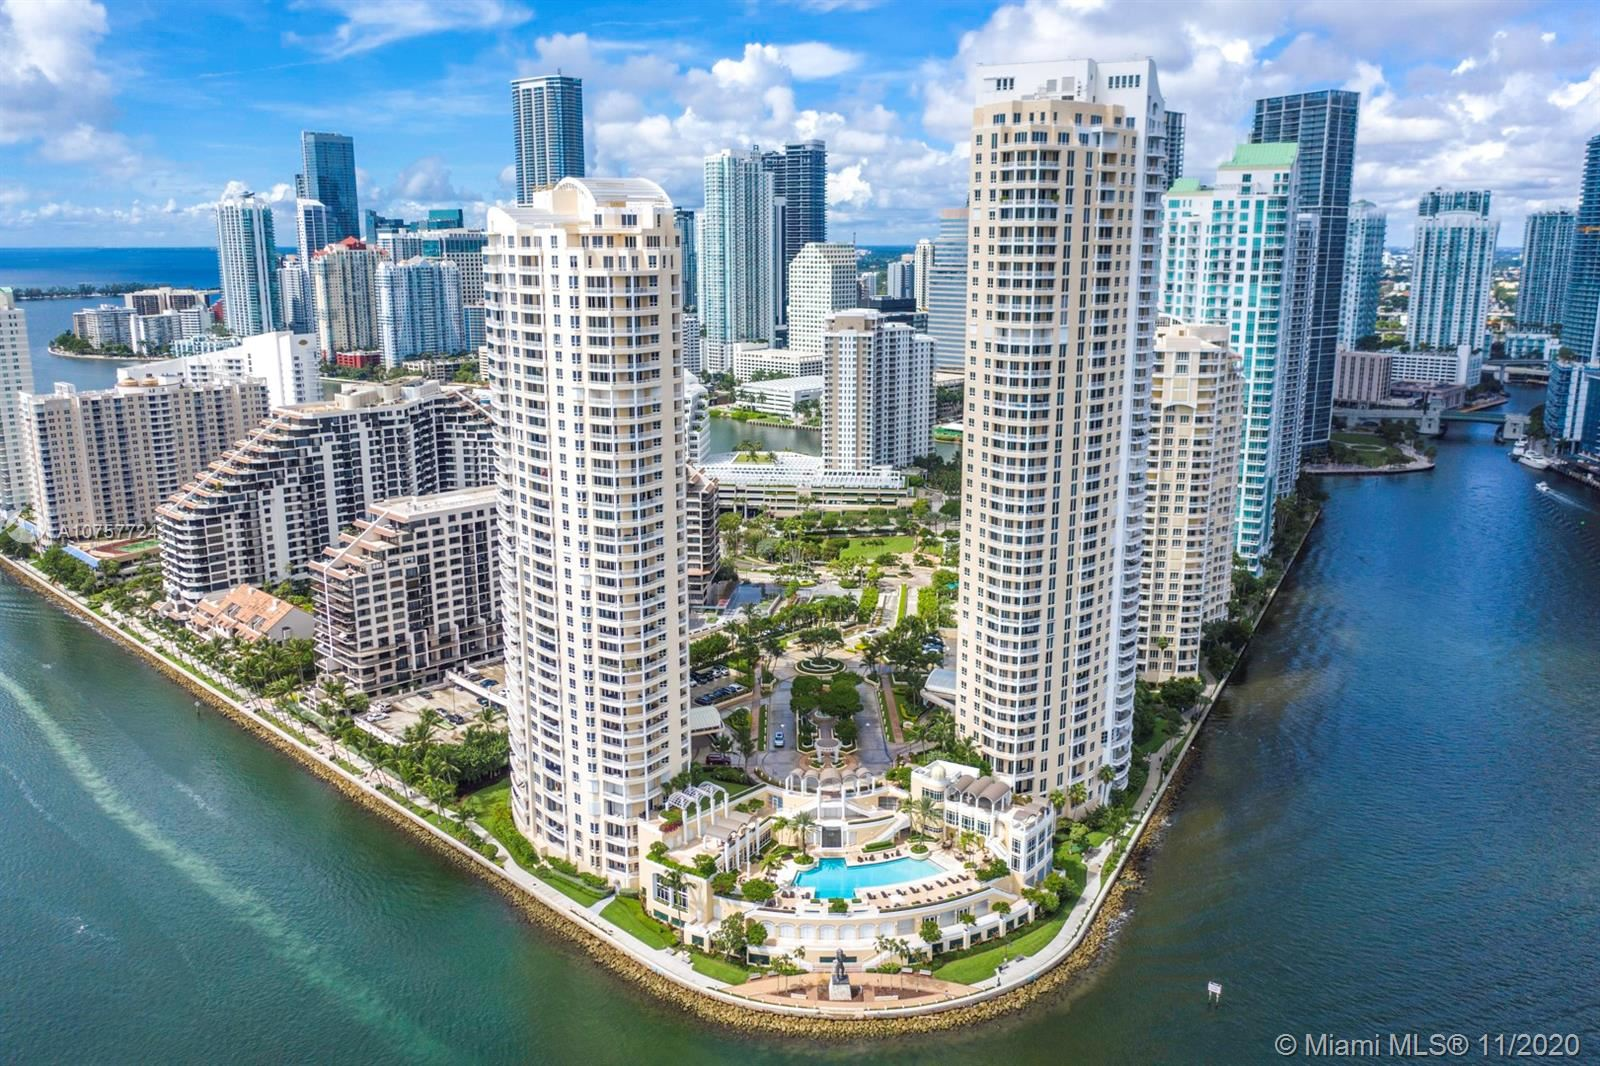 848 Brickell Key Dr #601, Miami, FL 33131 - #: A10757724